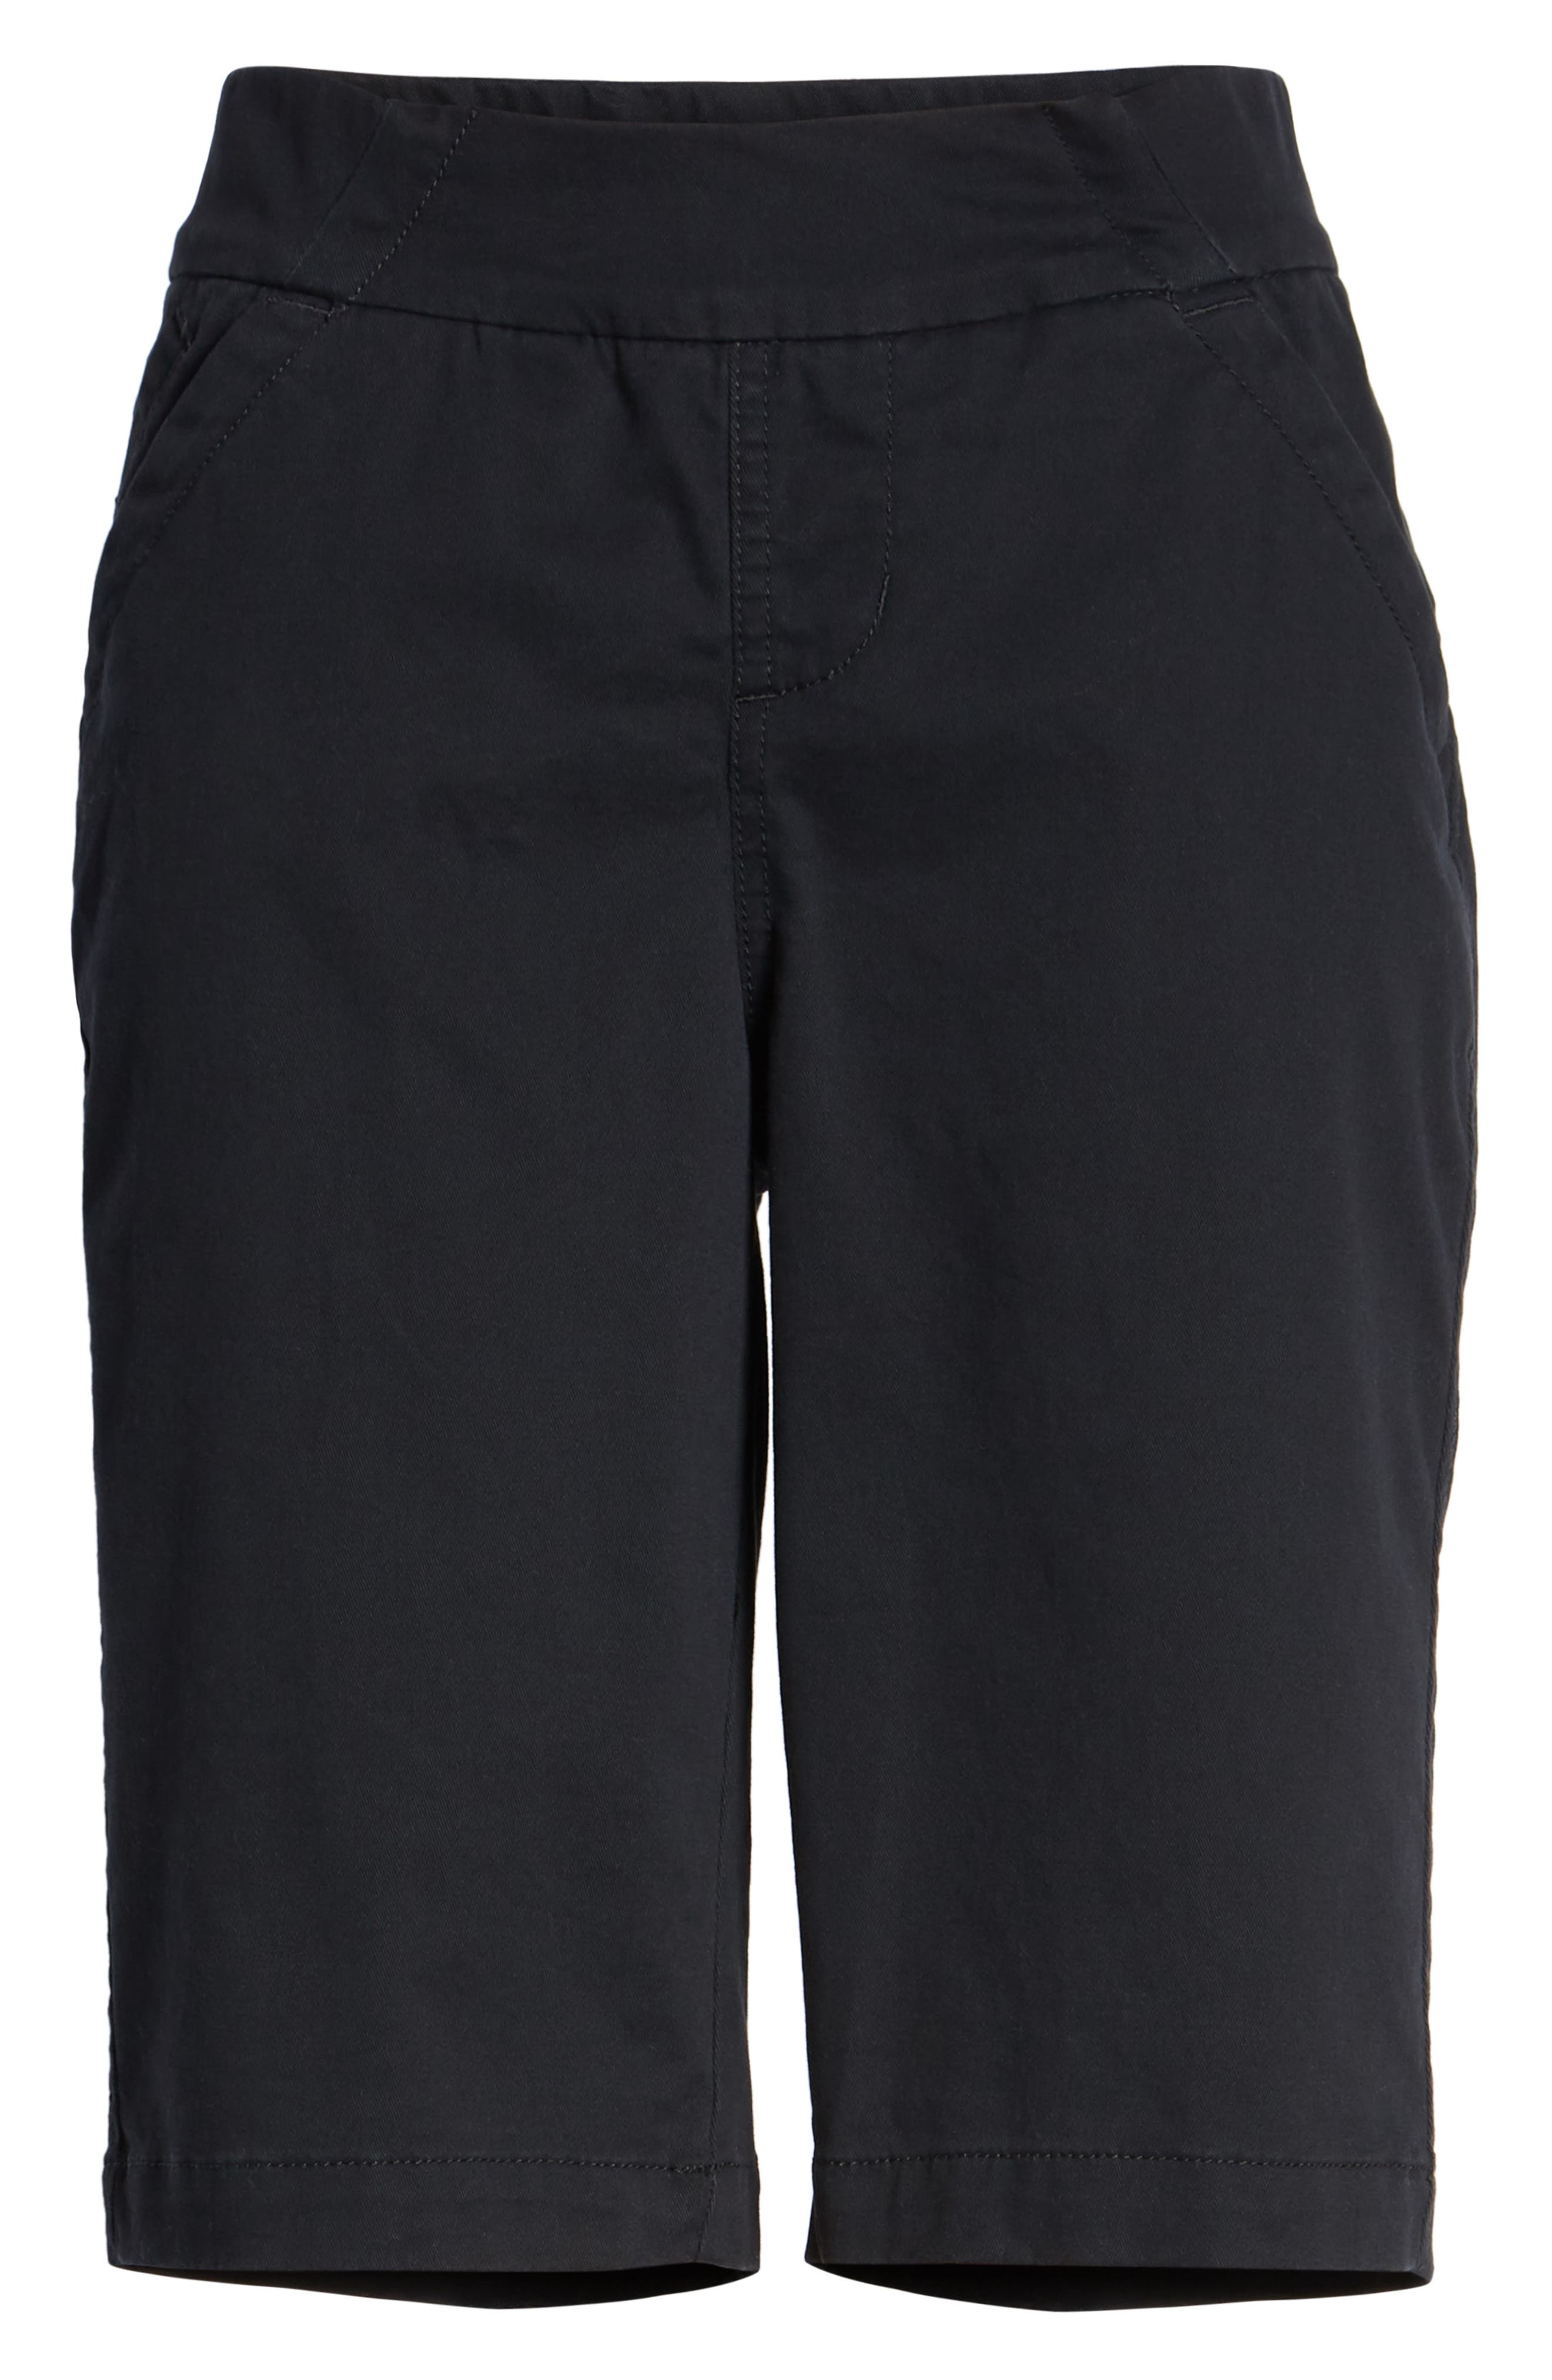 Gracie Bermuda Shorts,                             Alternate thumbnail 7, color,                             BLACK